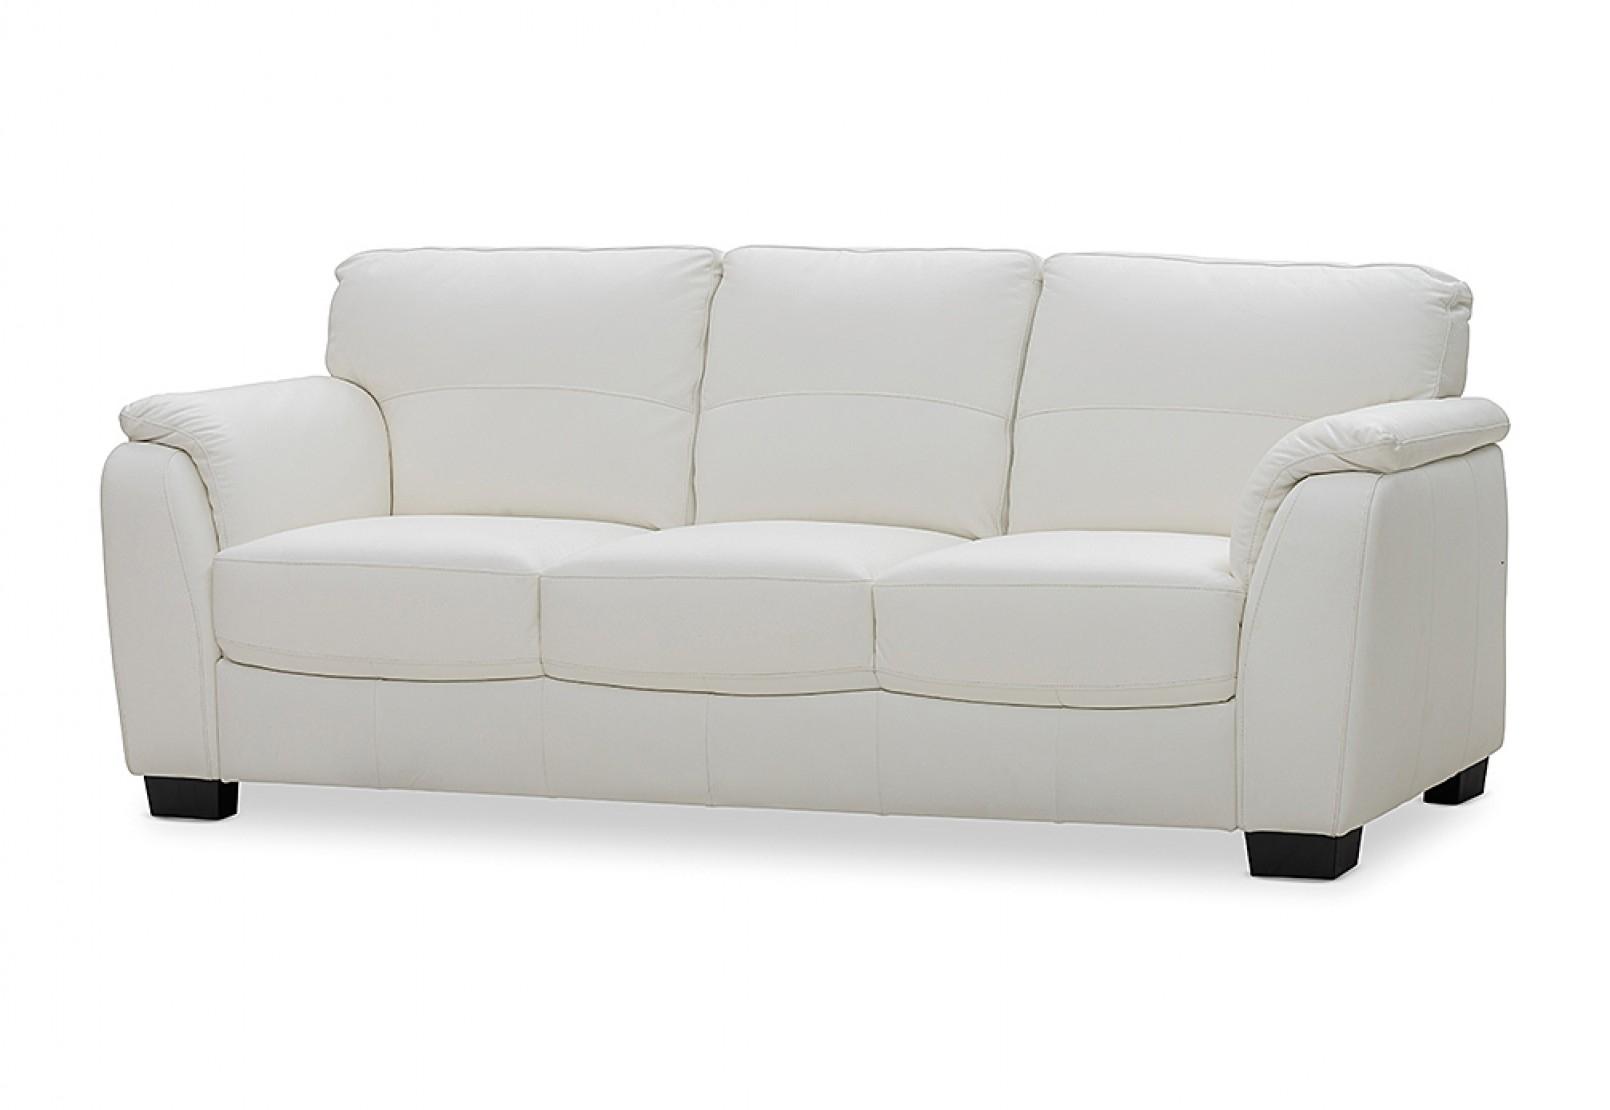 Marissa Leather 3 Seater Sofa | Amart Furniture With Marissa Sofa Chairs (Image 15 of 25)